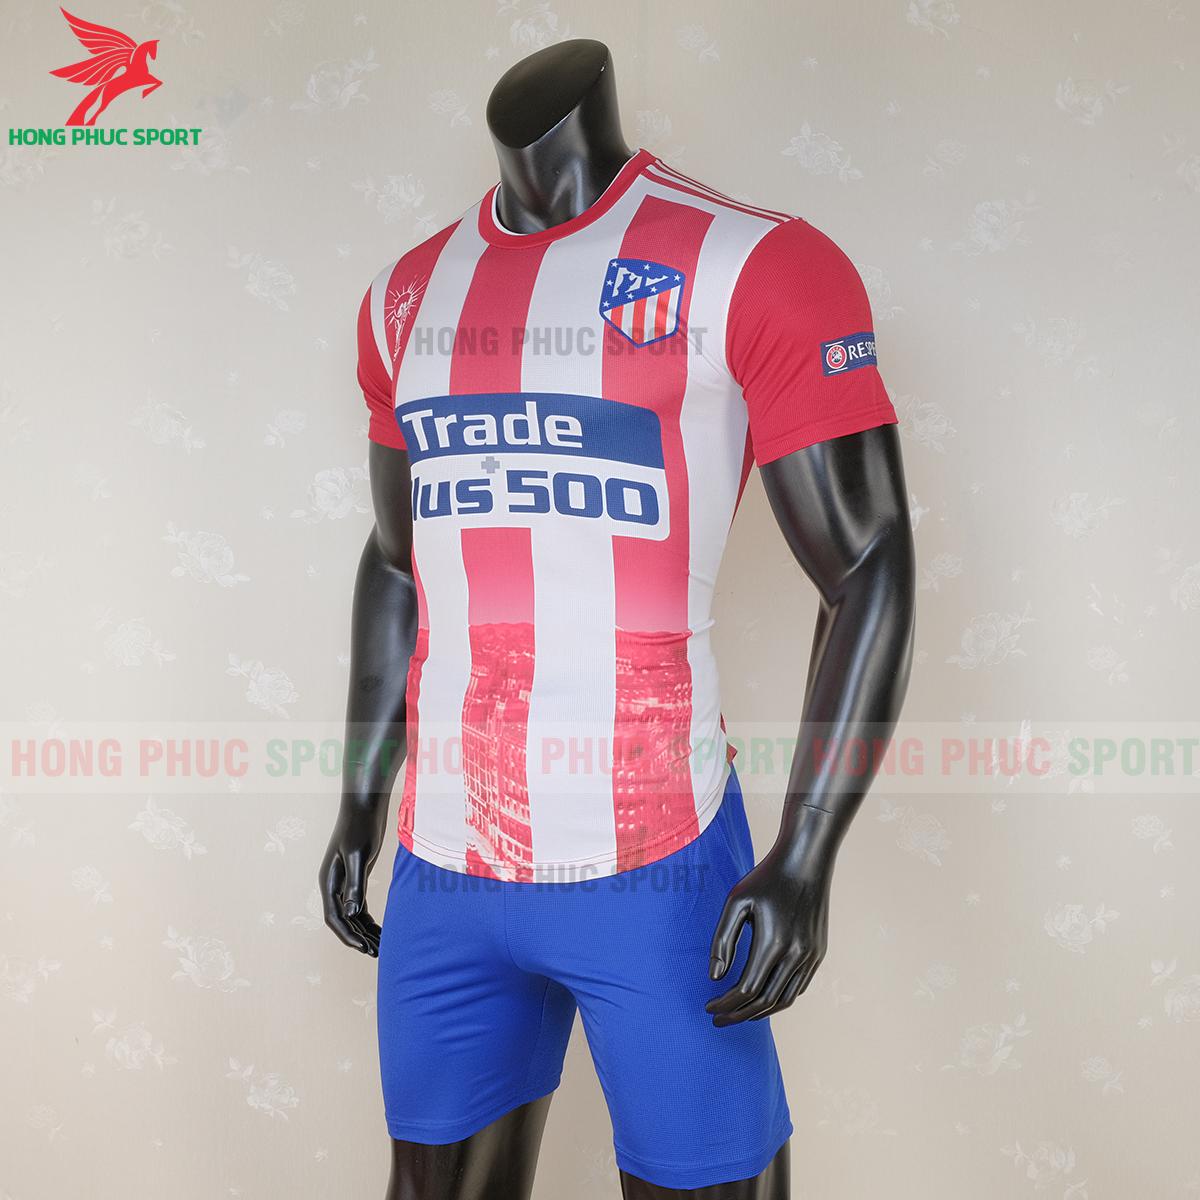 https://cdn.hongphucsport.com/unsafe/s4.shopbay.vn/files/285/ao-bong-da-atletico-madrid-2020-2021-phien-ban-fan-mau-2-6-5f6d4c608cc3c.png